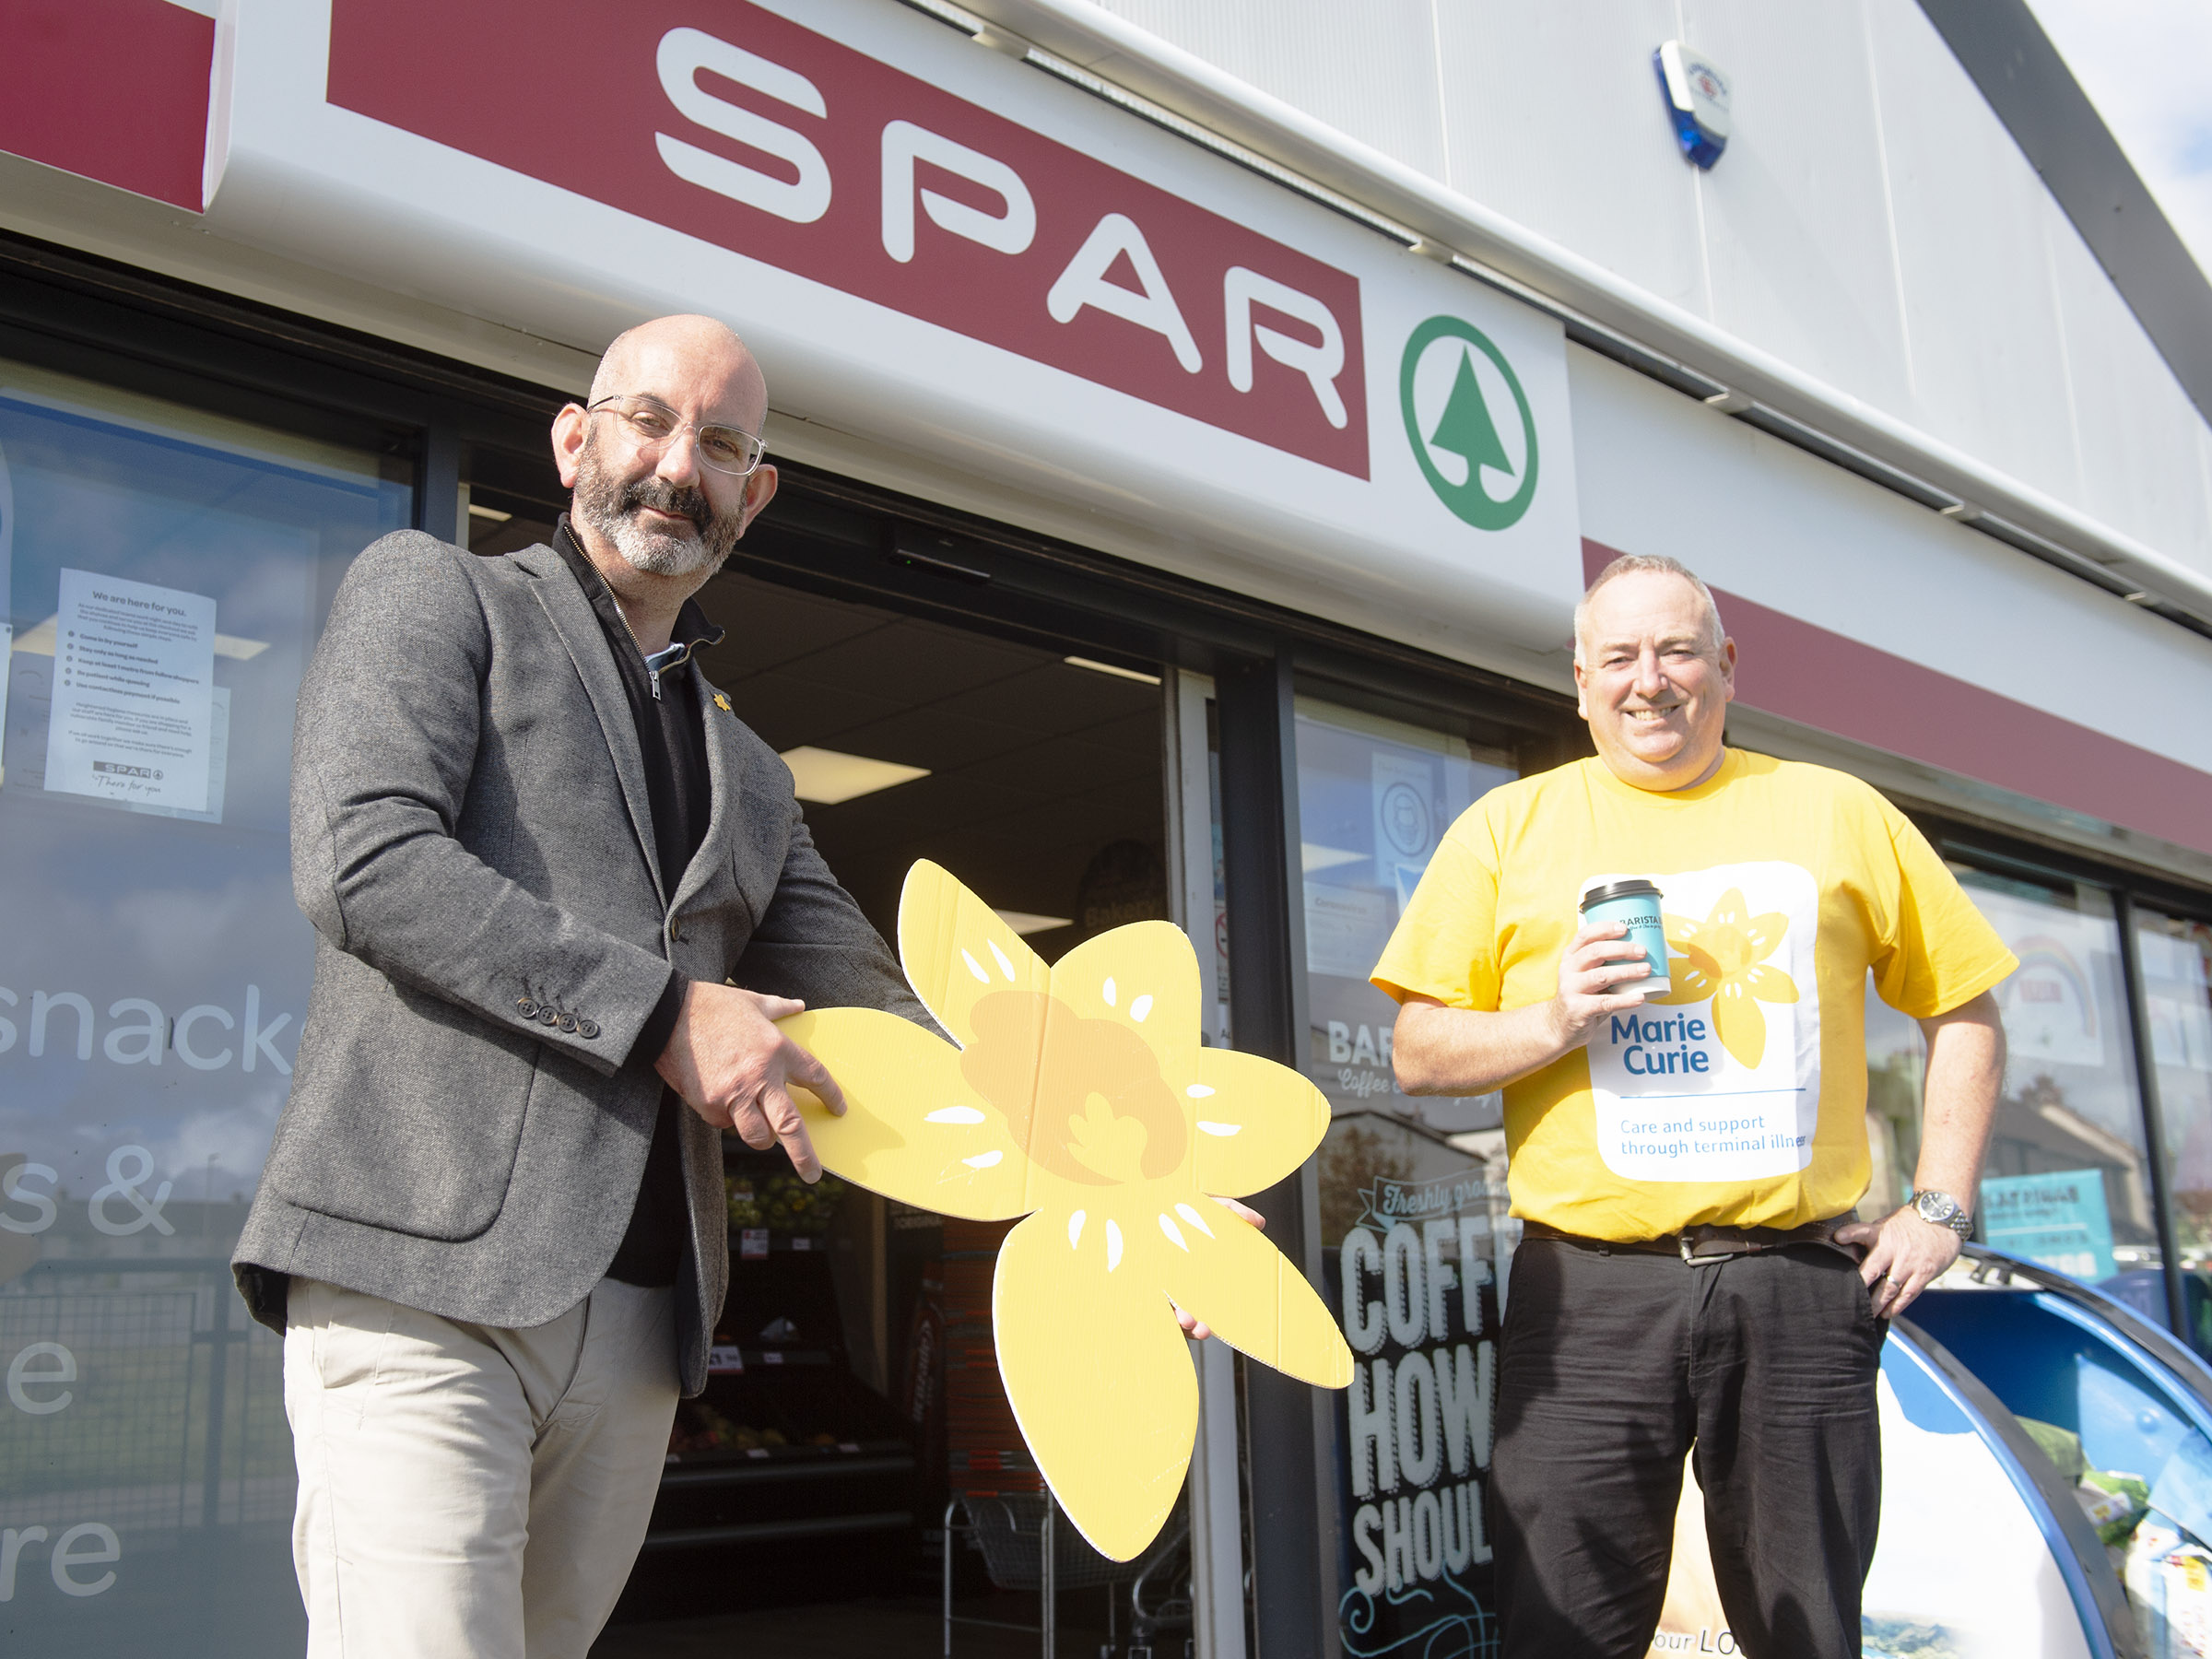 SPAR Craigyhill raises over £2,000 for Marie Curie